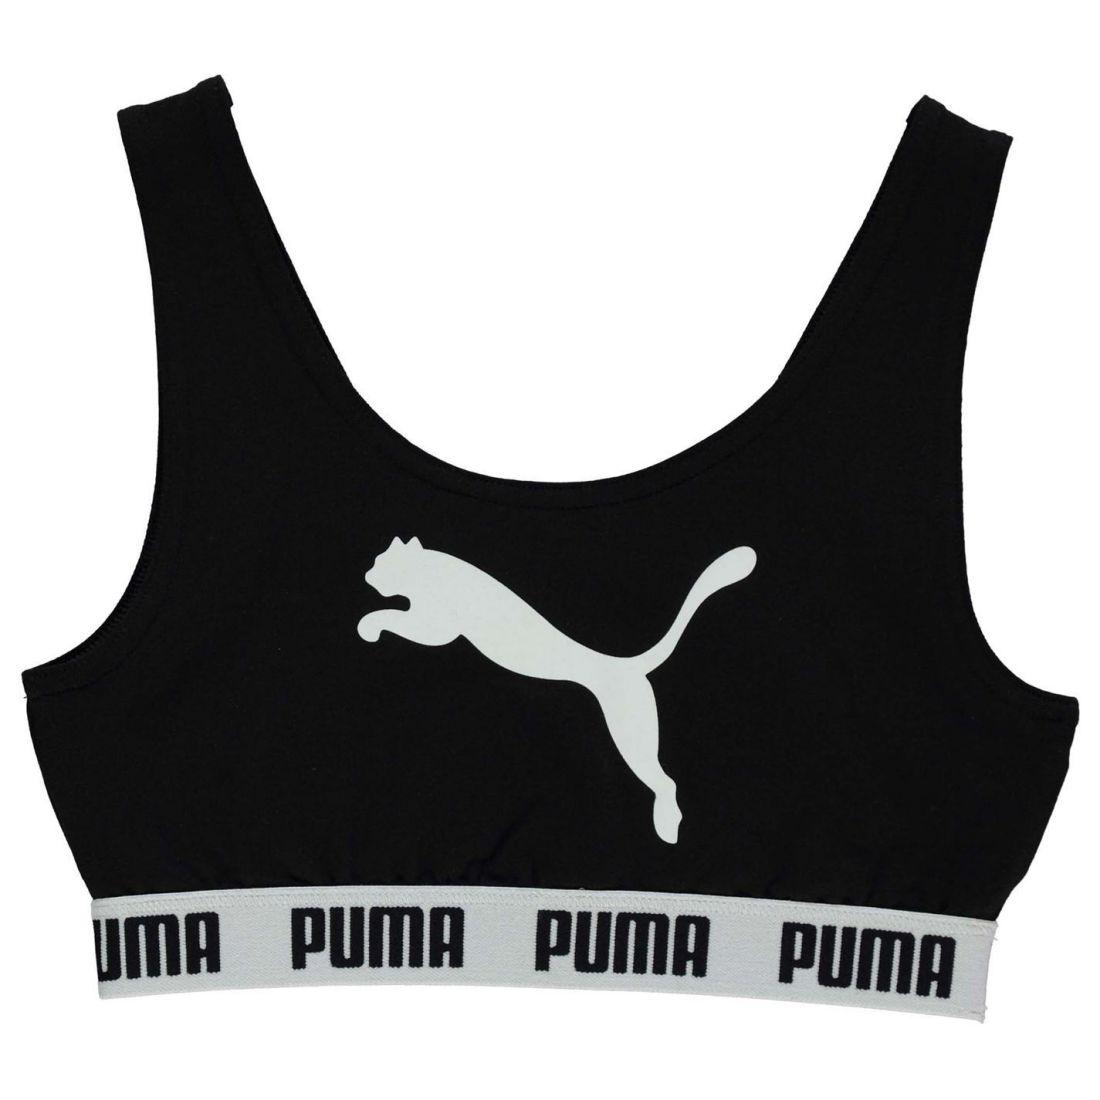 ee3bd3547a Details about Puma Kids Girls Tape Crop Top Junior Vest Tank Crew Neck  Stretch Print Sports